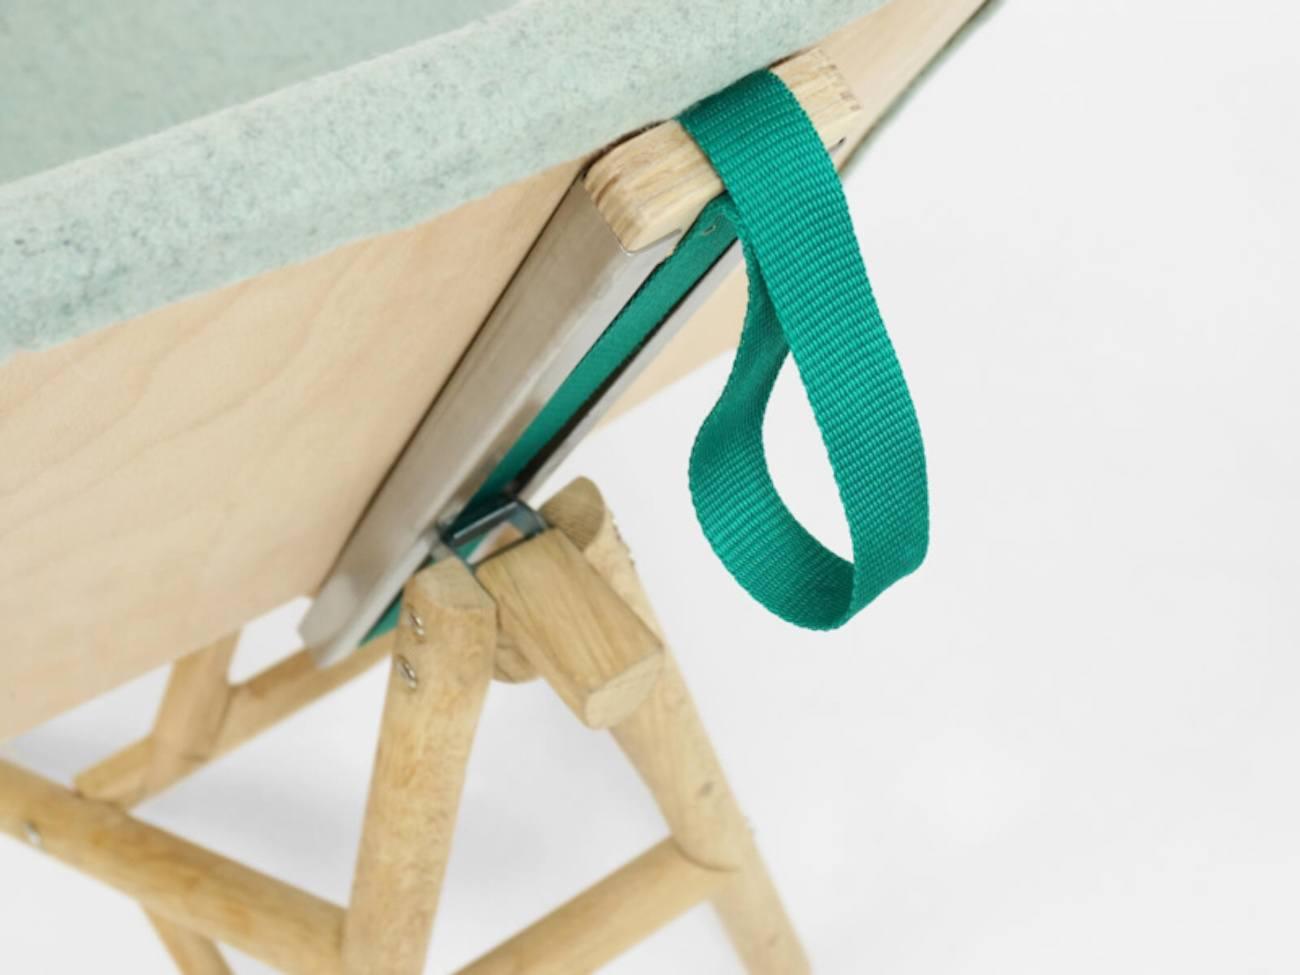 Hybrid Chair by Studio Lorier